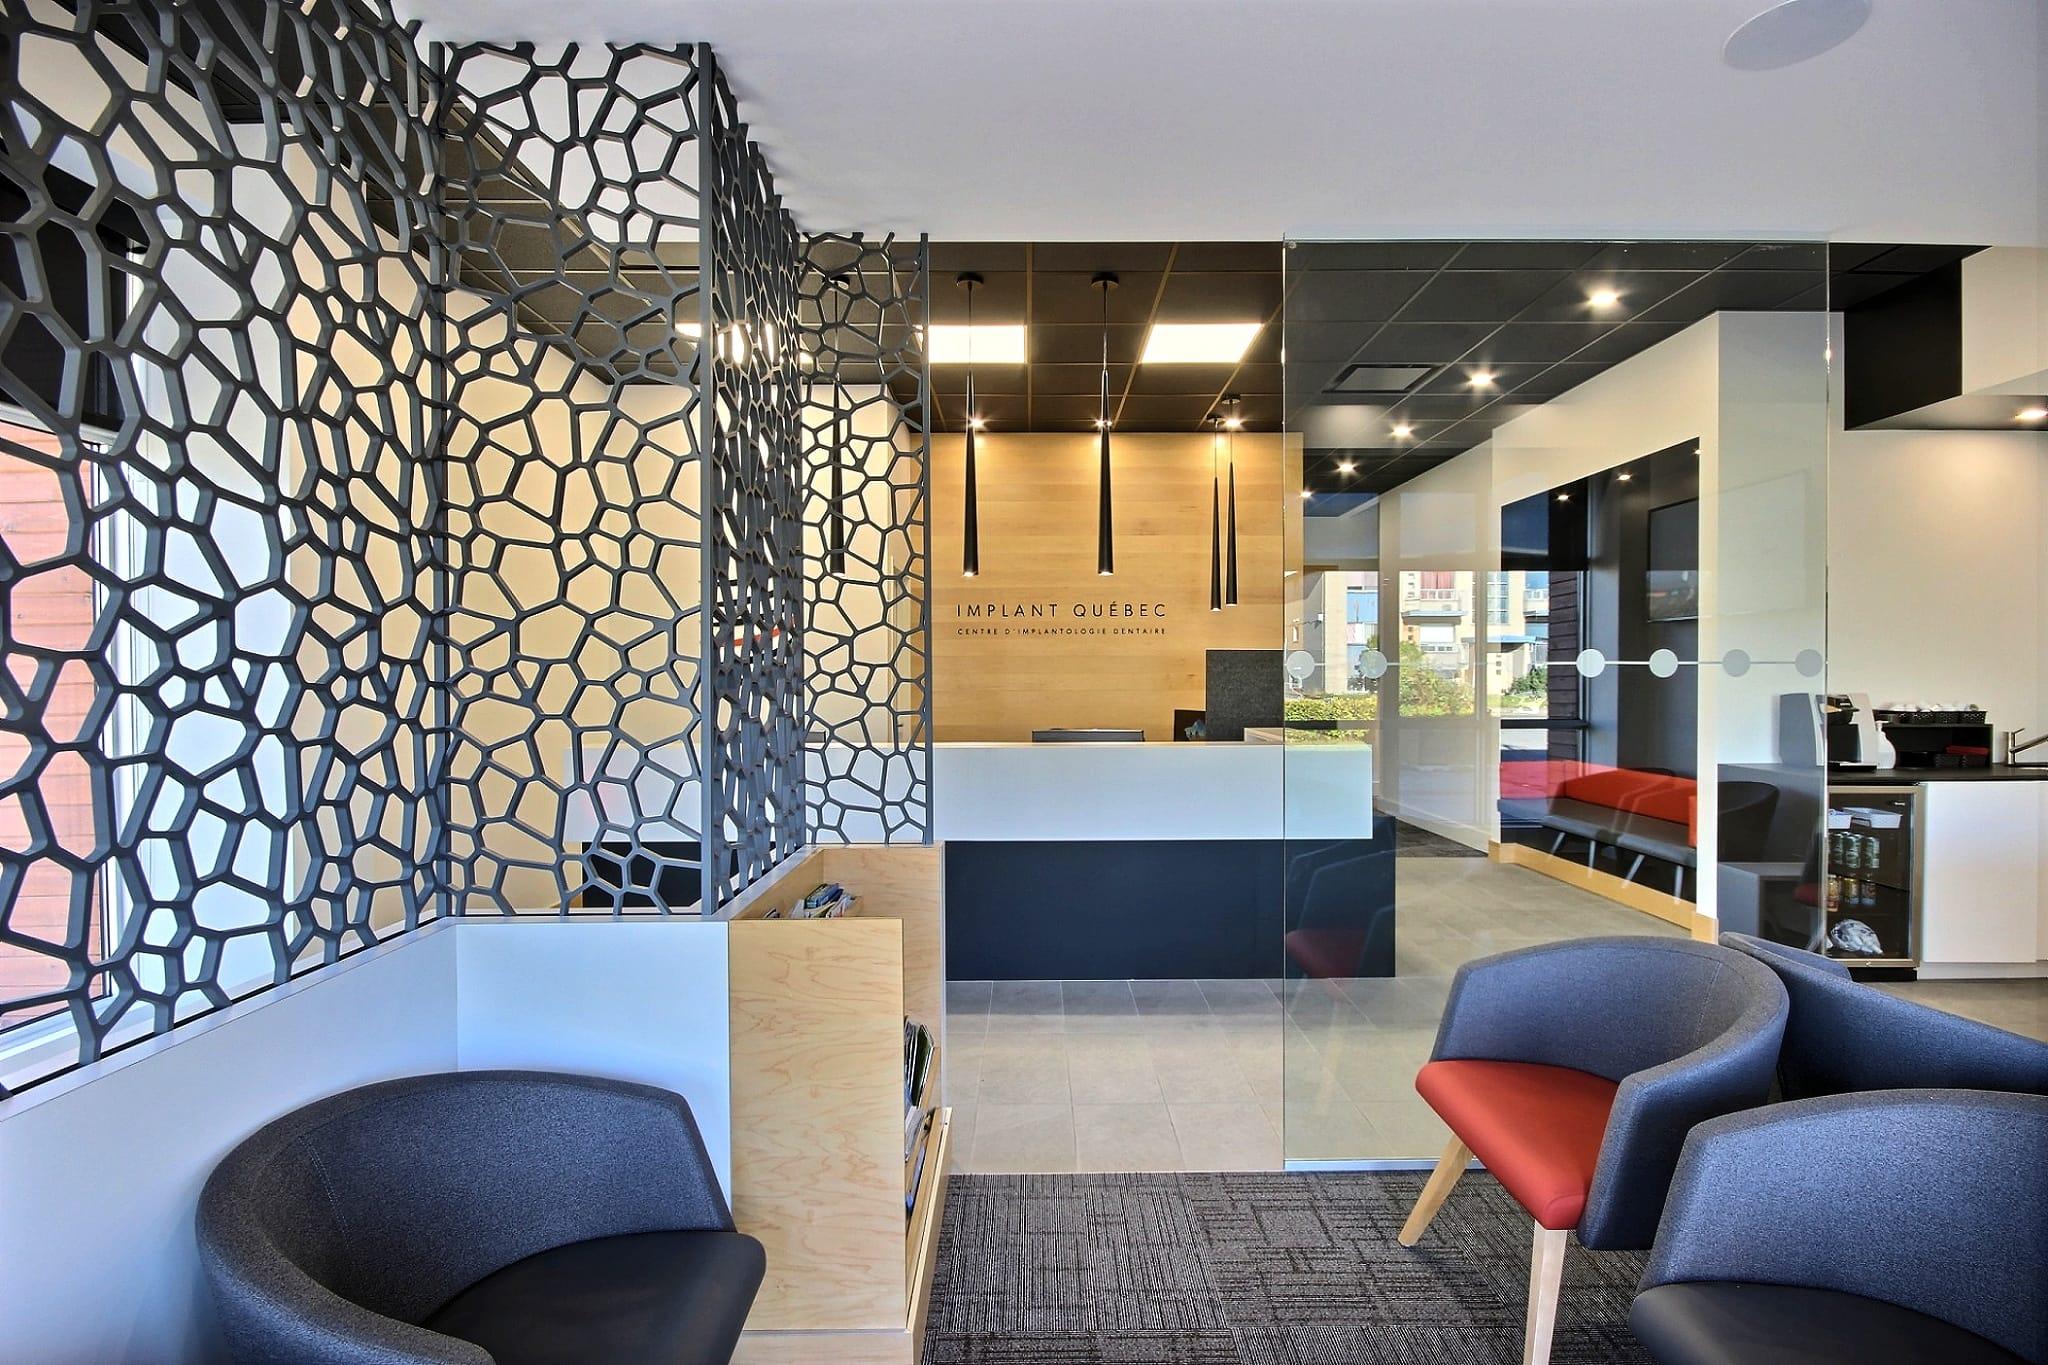 Salle d'attente design